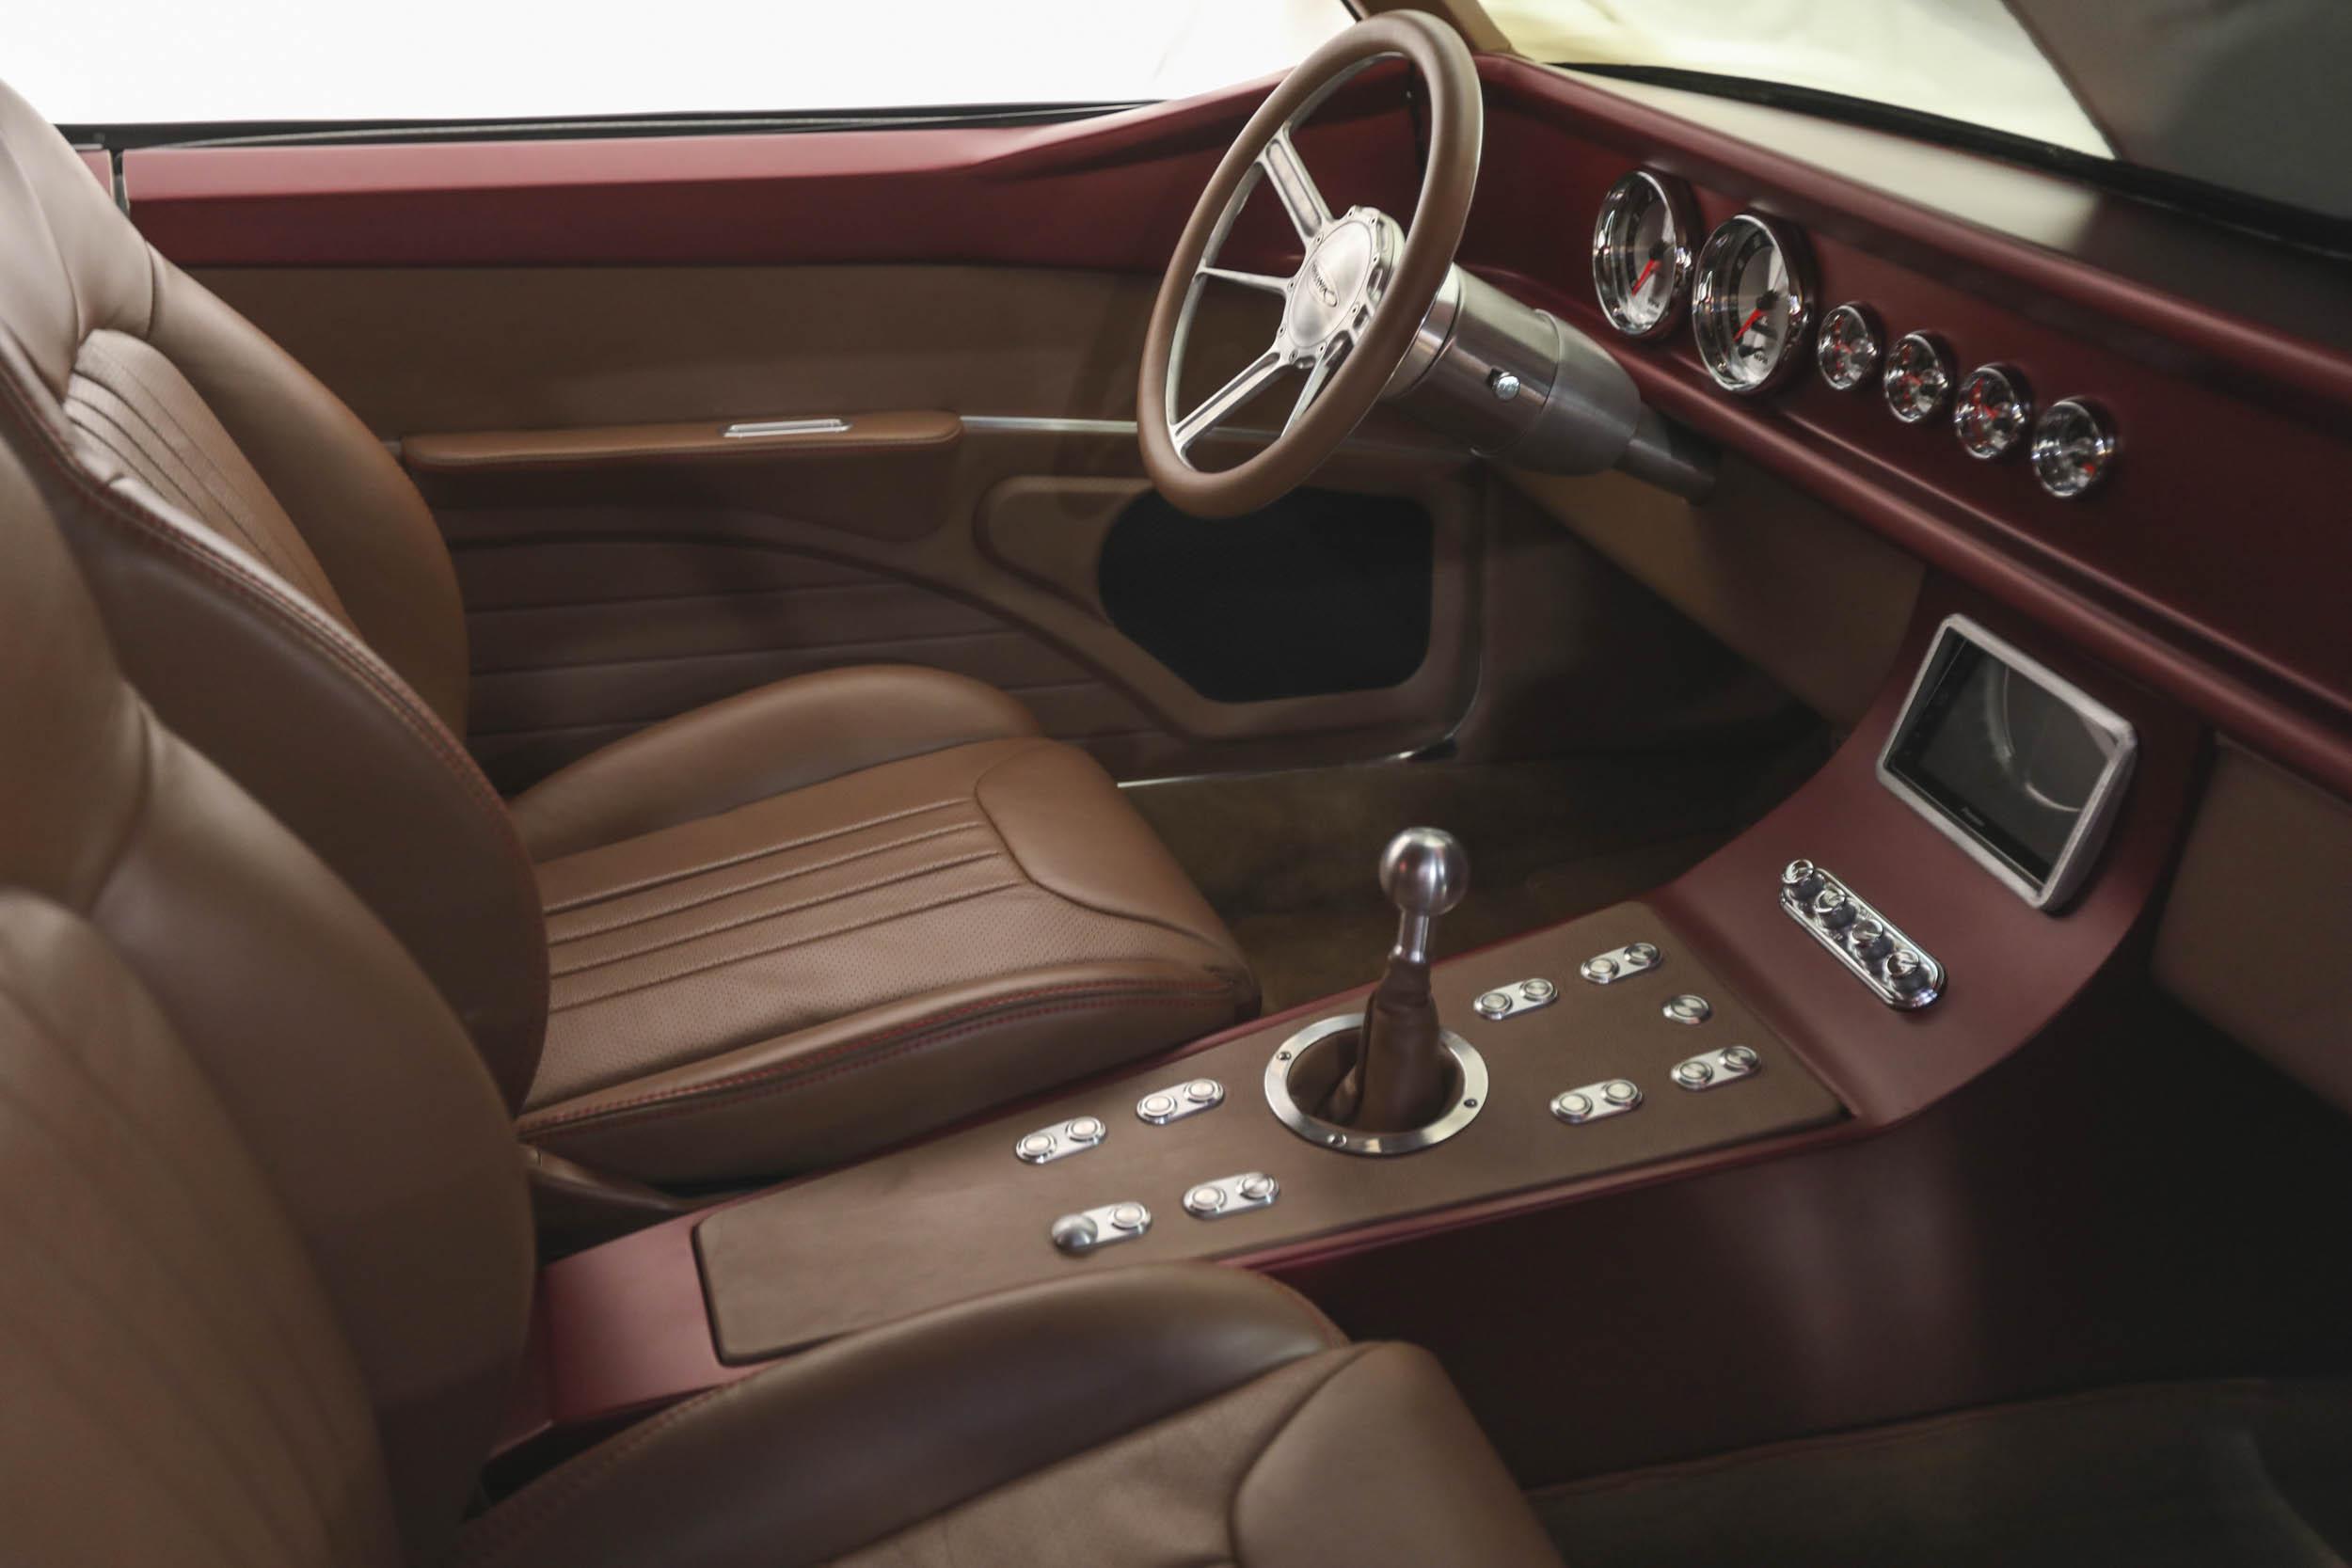 SEMA car interior